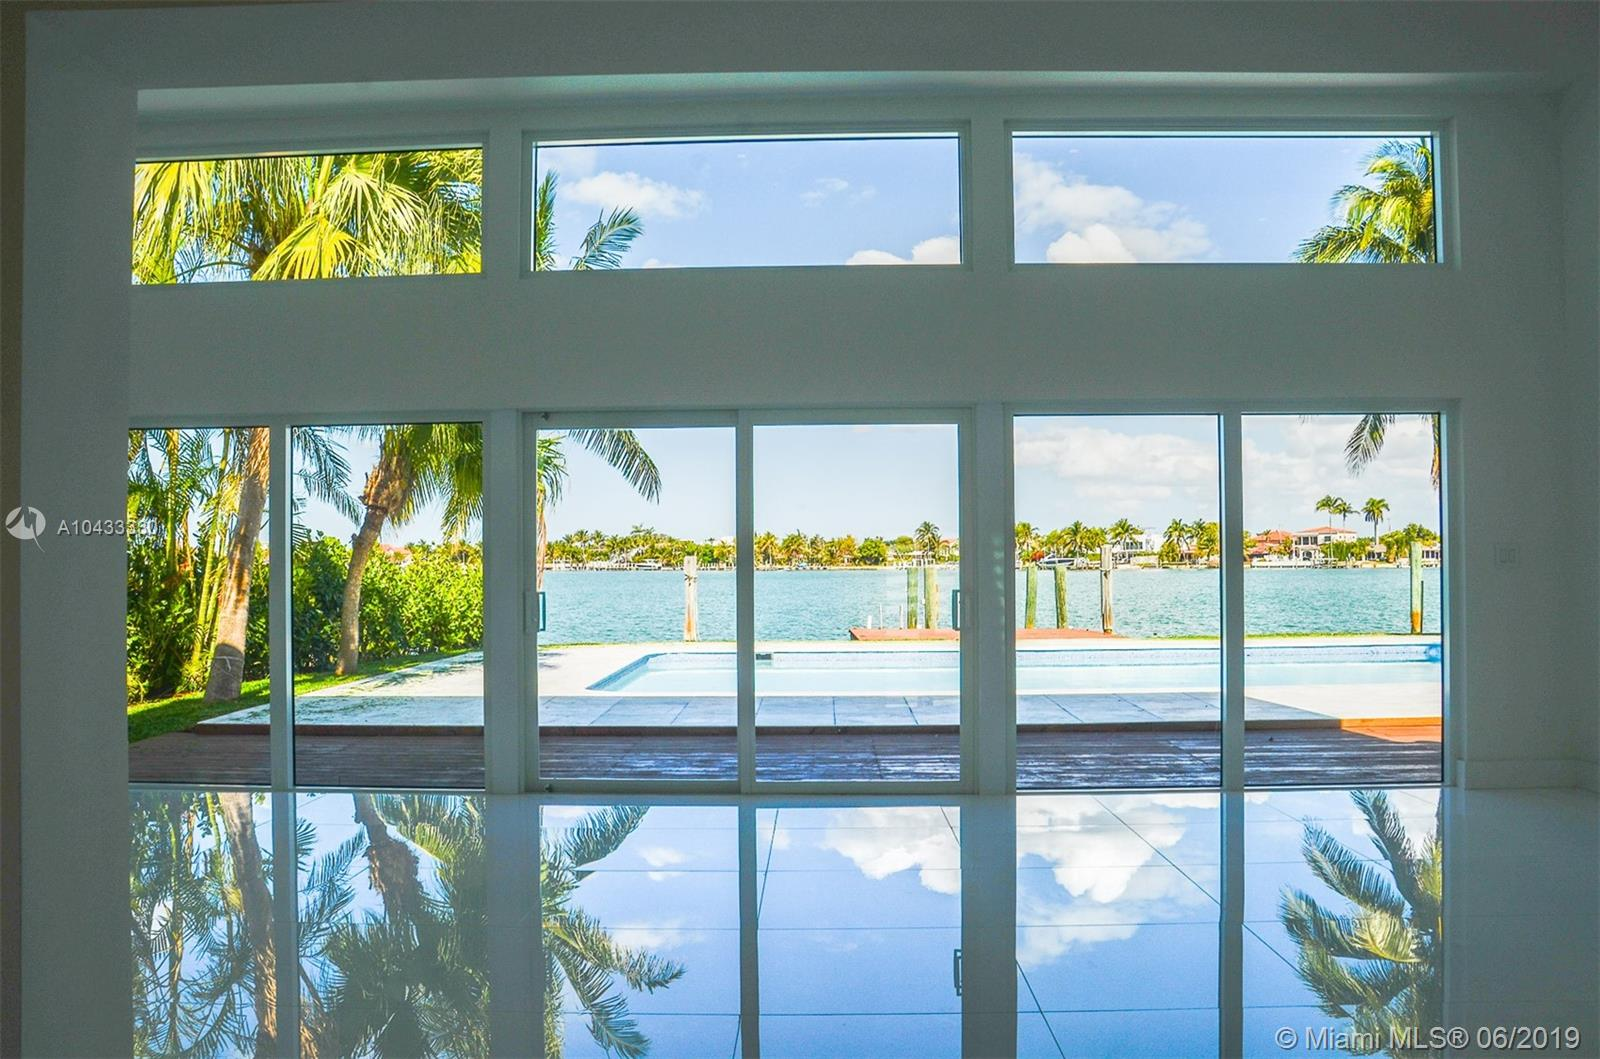 1215 N Biscayne Point Rd, Miami Beach, FL 33141 - Miami Beach, FL real estate listing